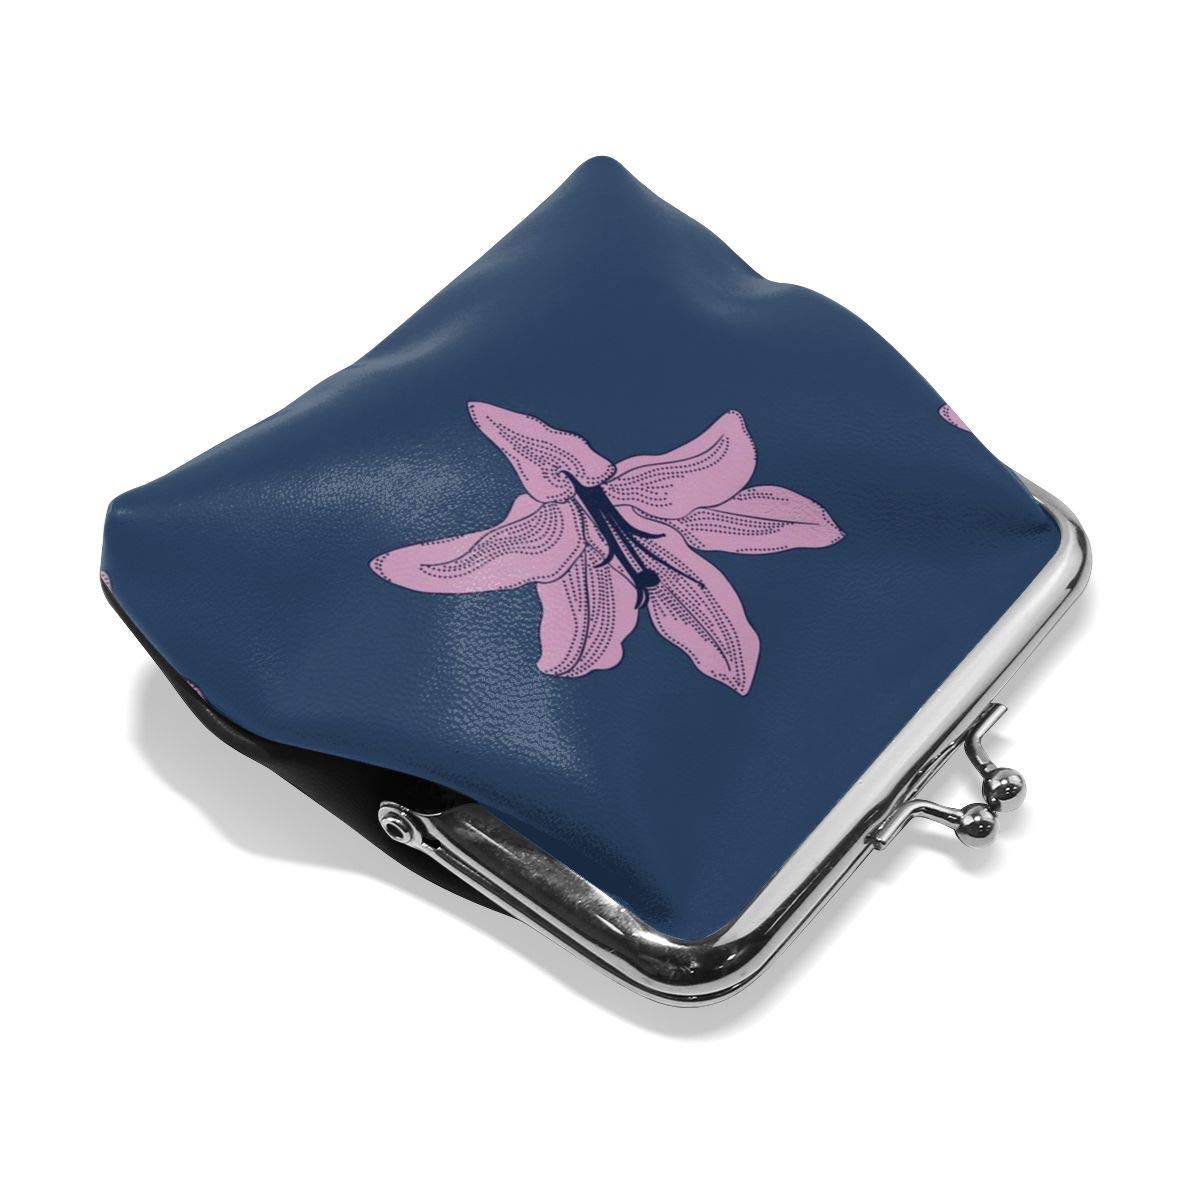 Personality Metal Lock Purse Architd Customized Cute Retro Coin Purse Girl Kiss And Buckle Change Purse Ladys HandbagPurple Lily